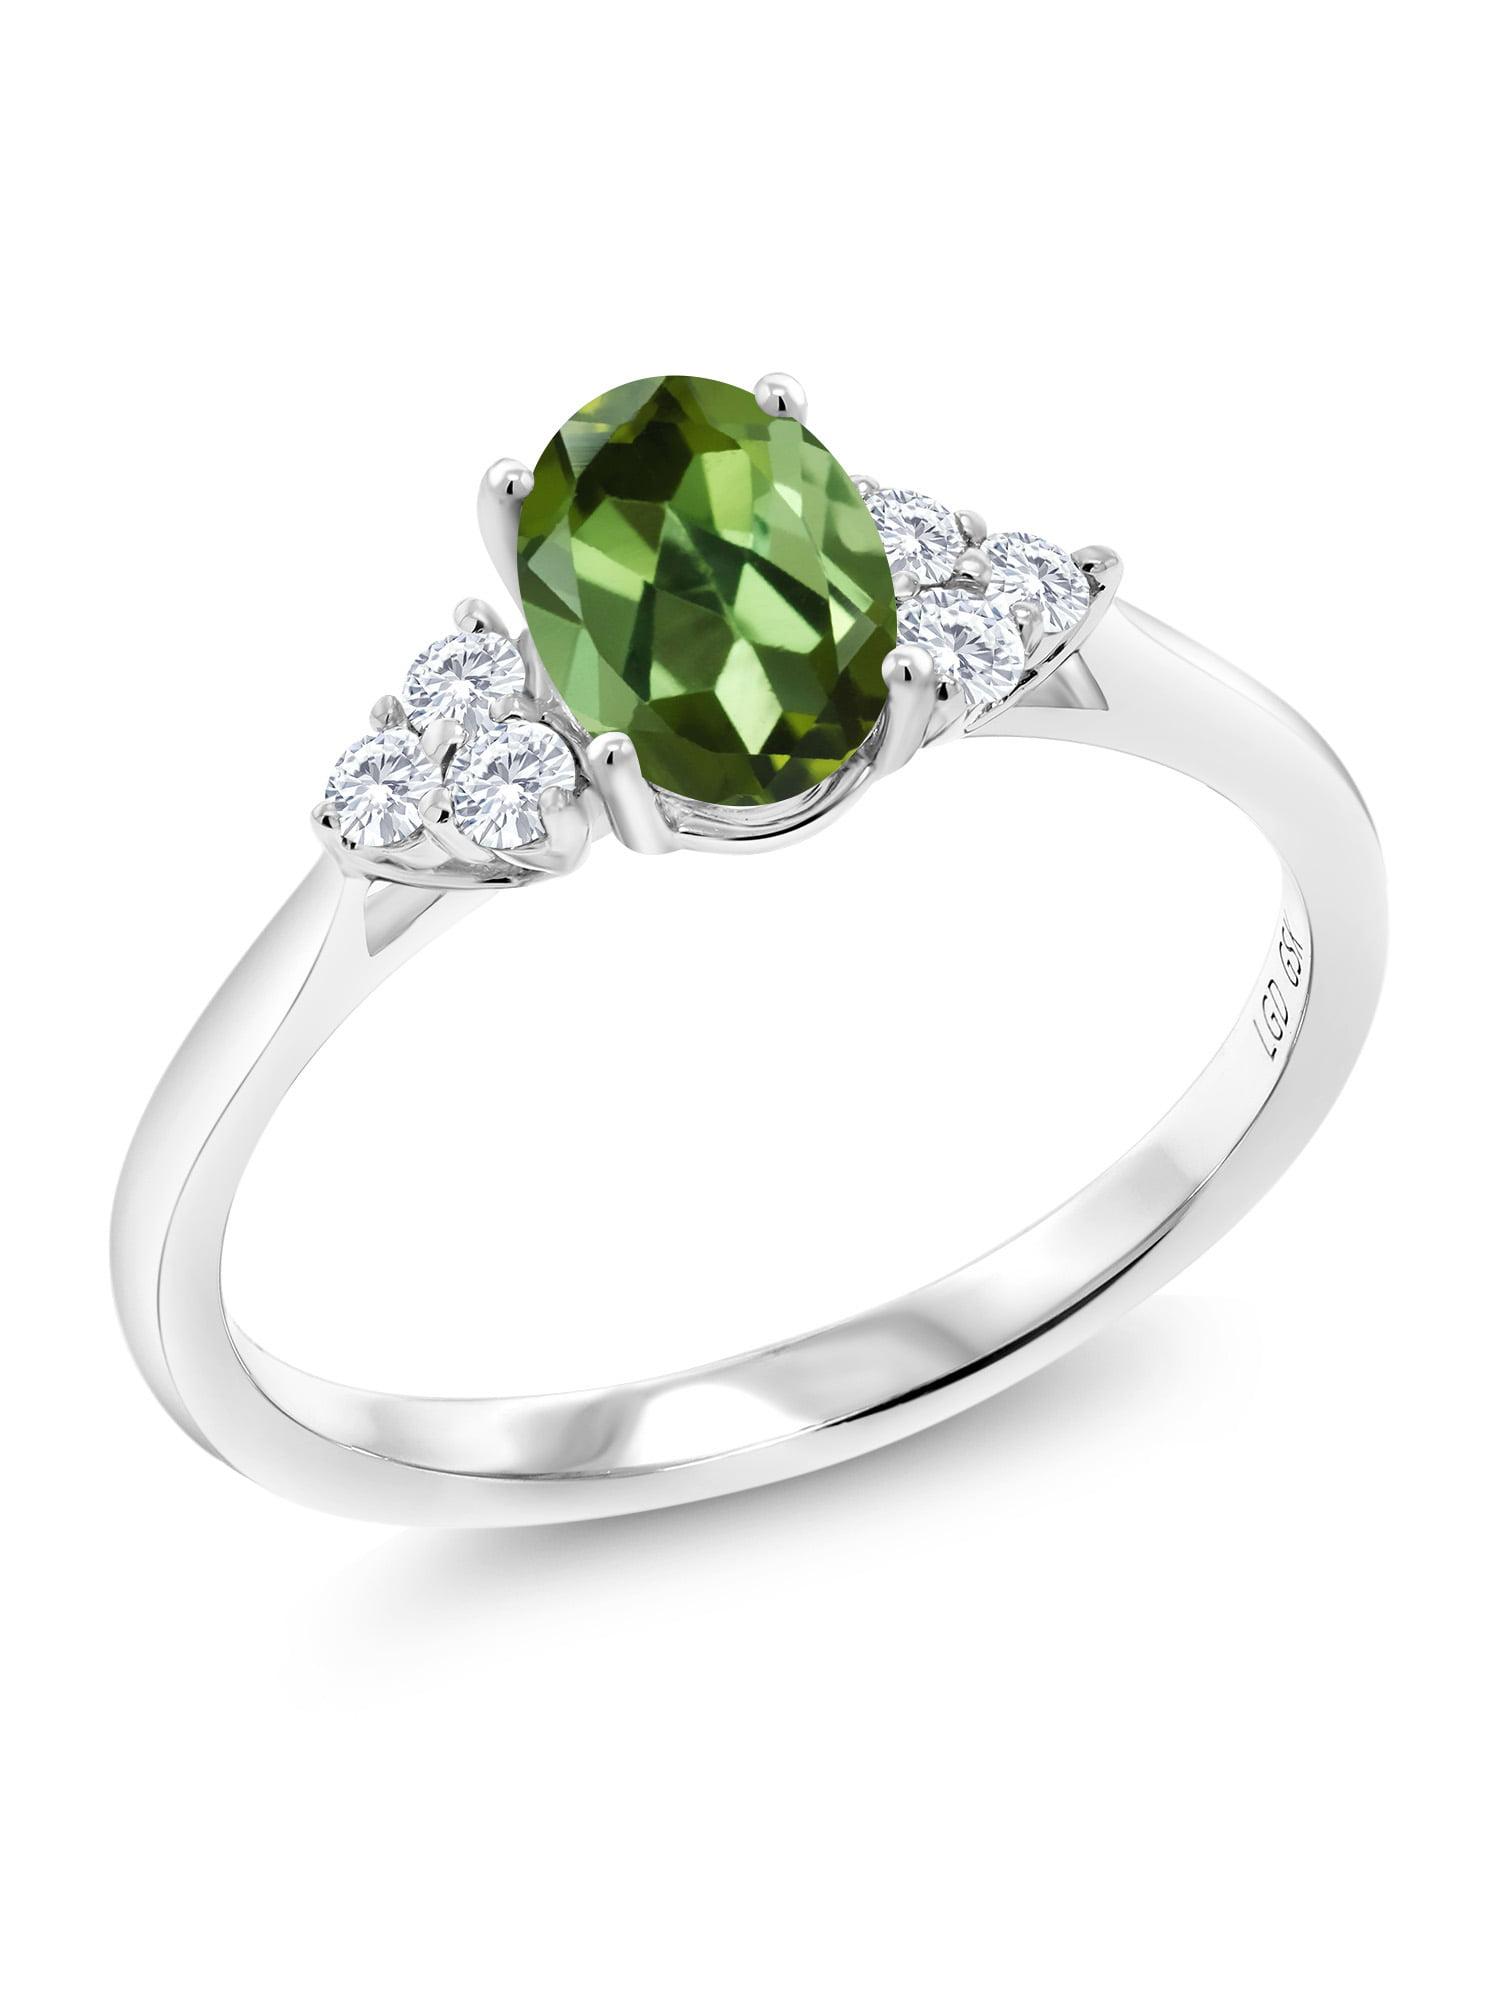 0.93 Ct Oval Green Tourmaline G H Lab Grown Diamond 10K White Gold Ring by